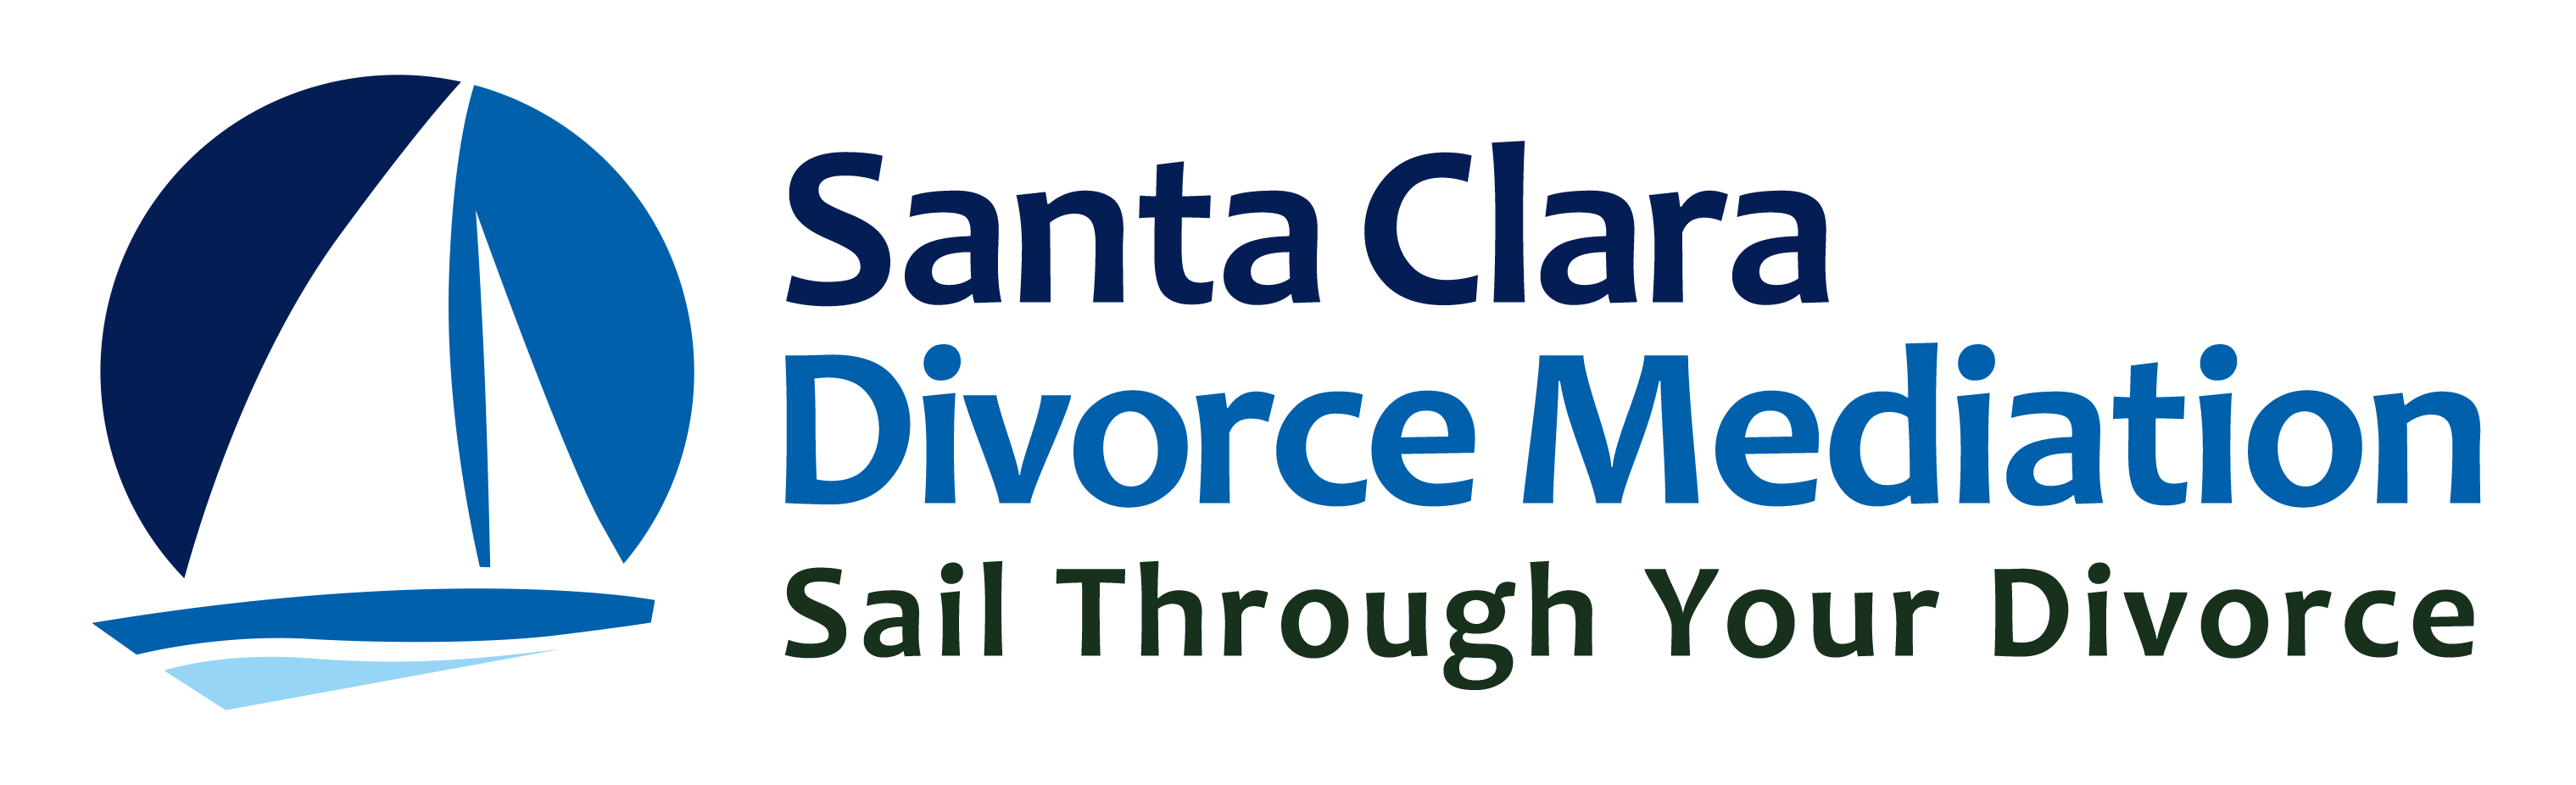 Demand for VIDEOCONFERENCE Divorce Mediation Service In San Jose CA Growing Rapidly